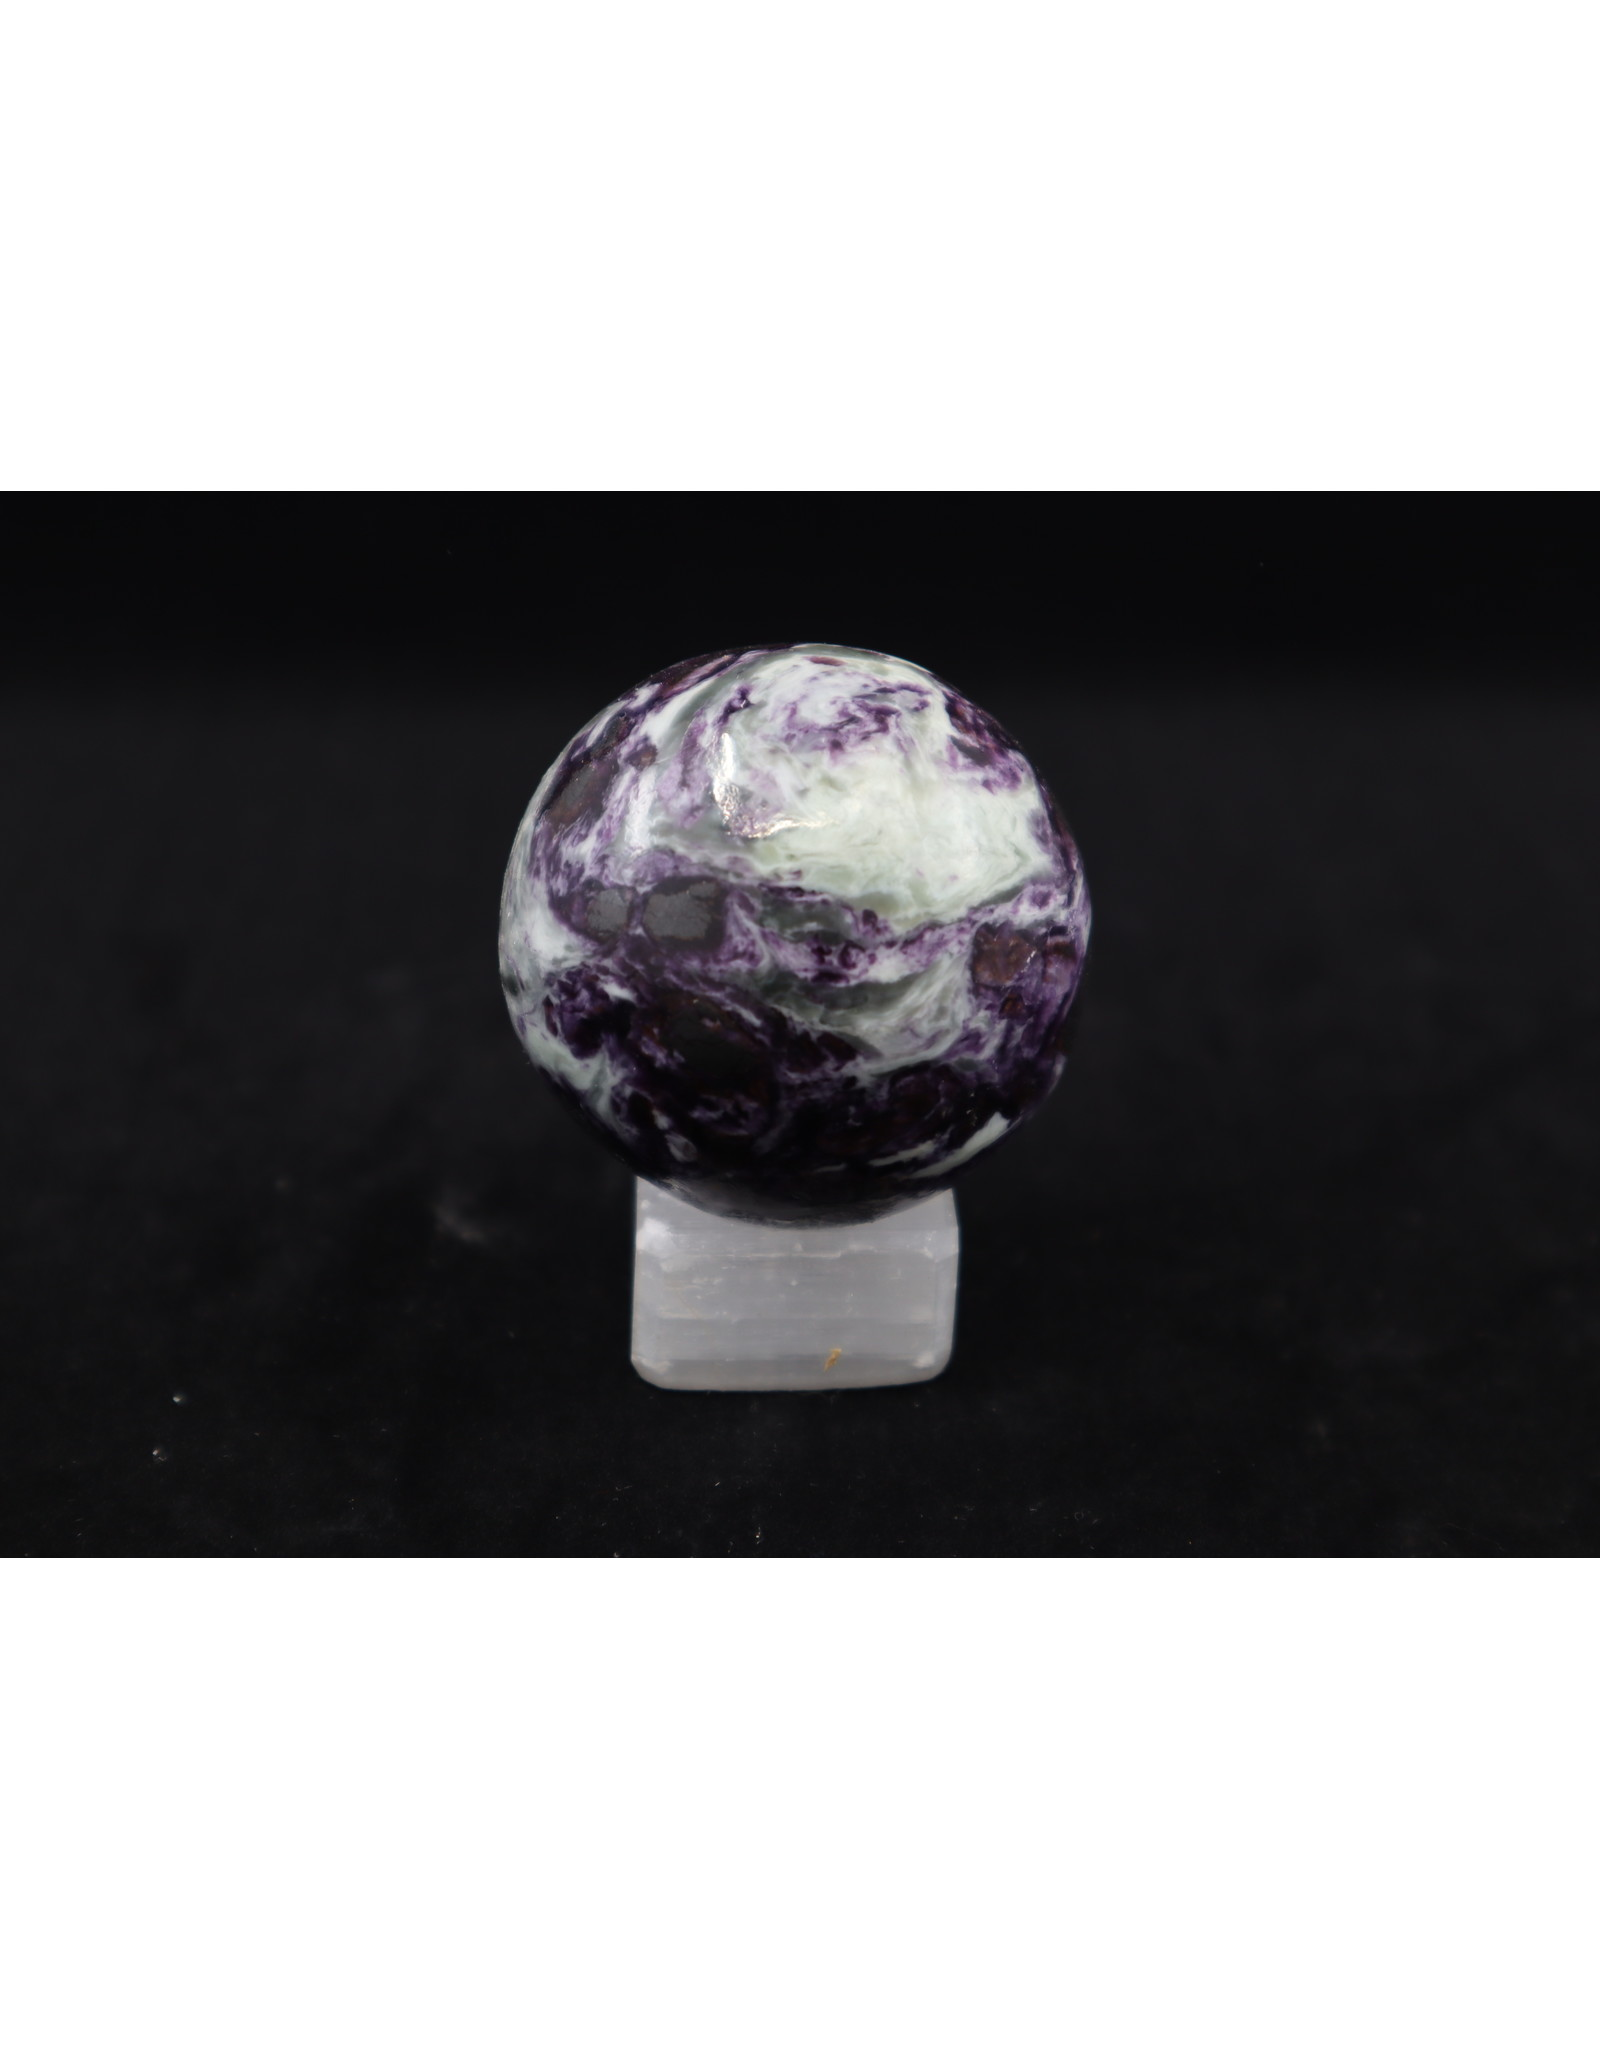 AAA Kammererite Sphere